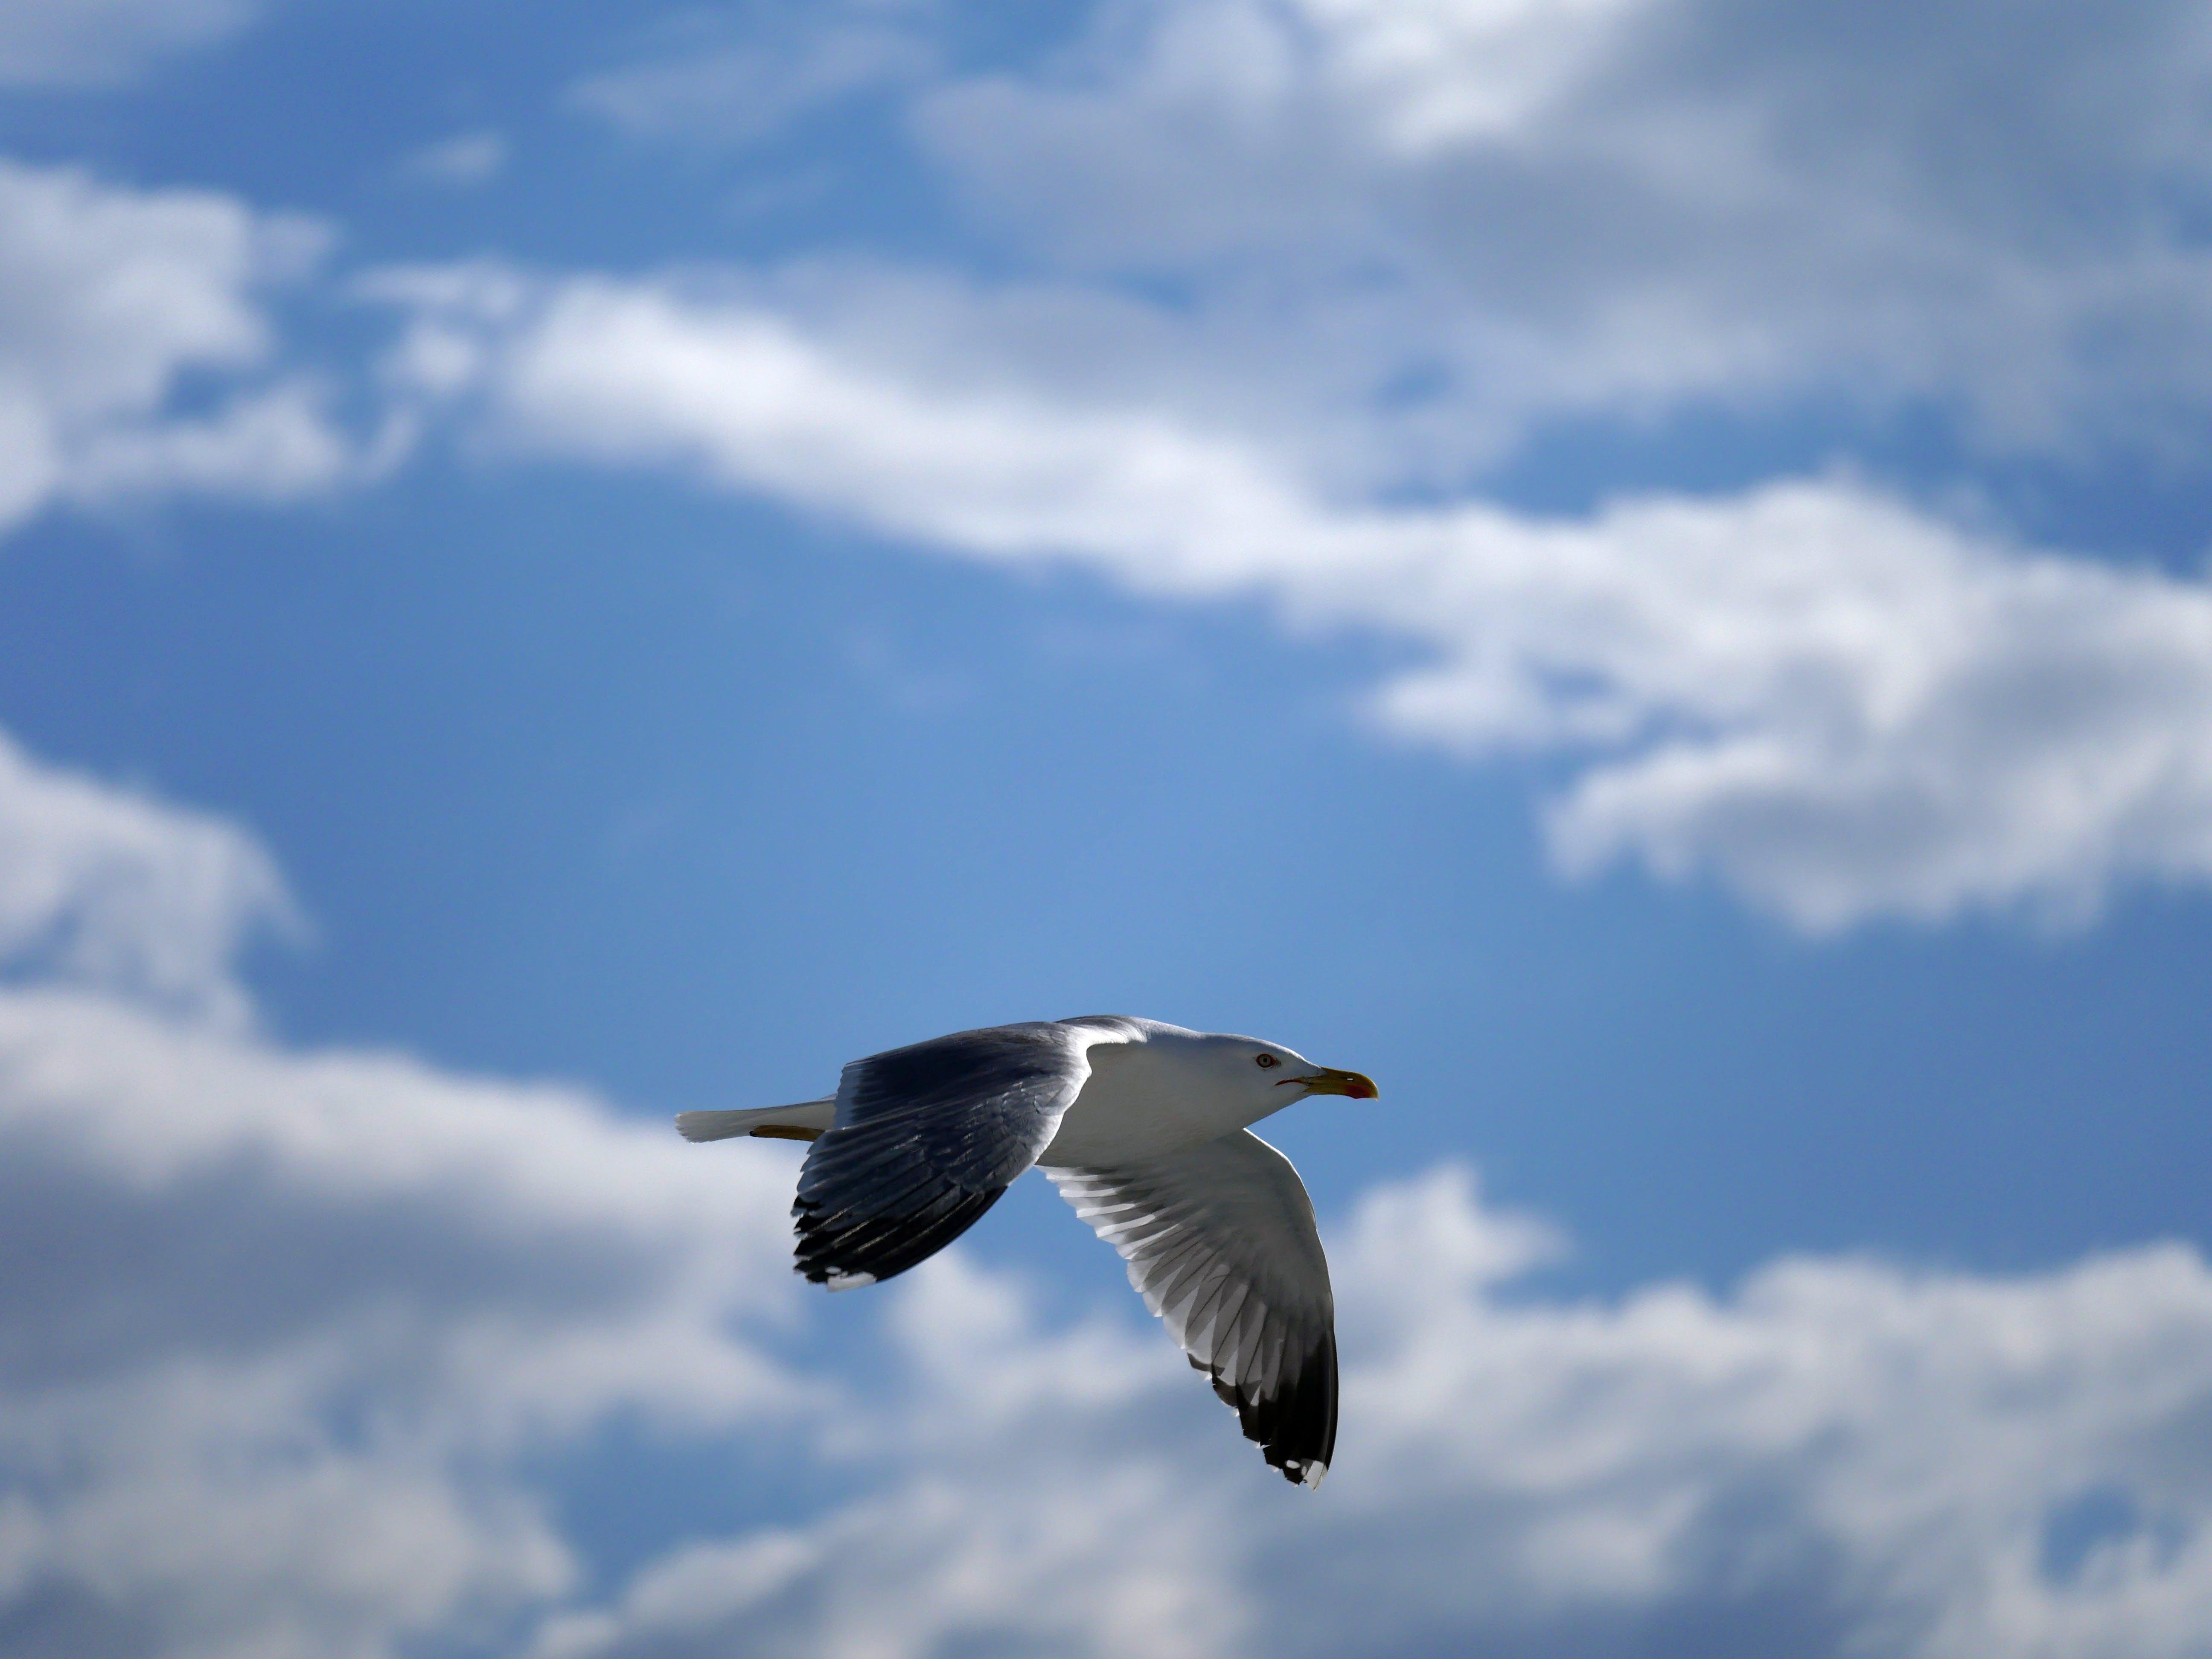 Fotos de stock gratuitas de agua, alas, animal, árido